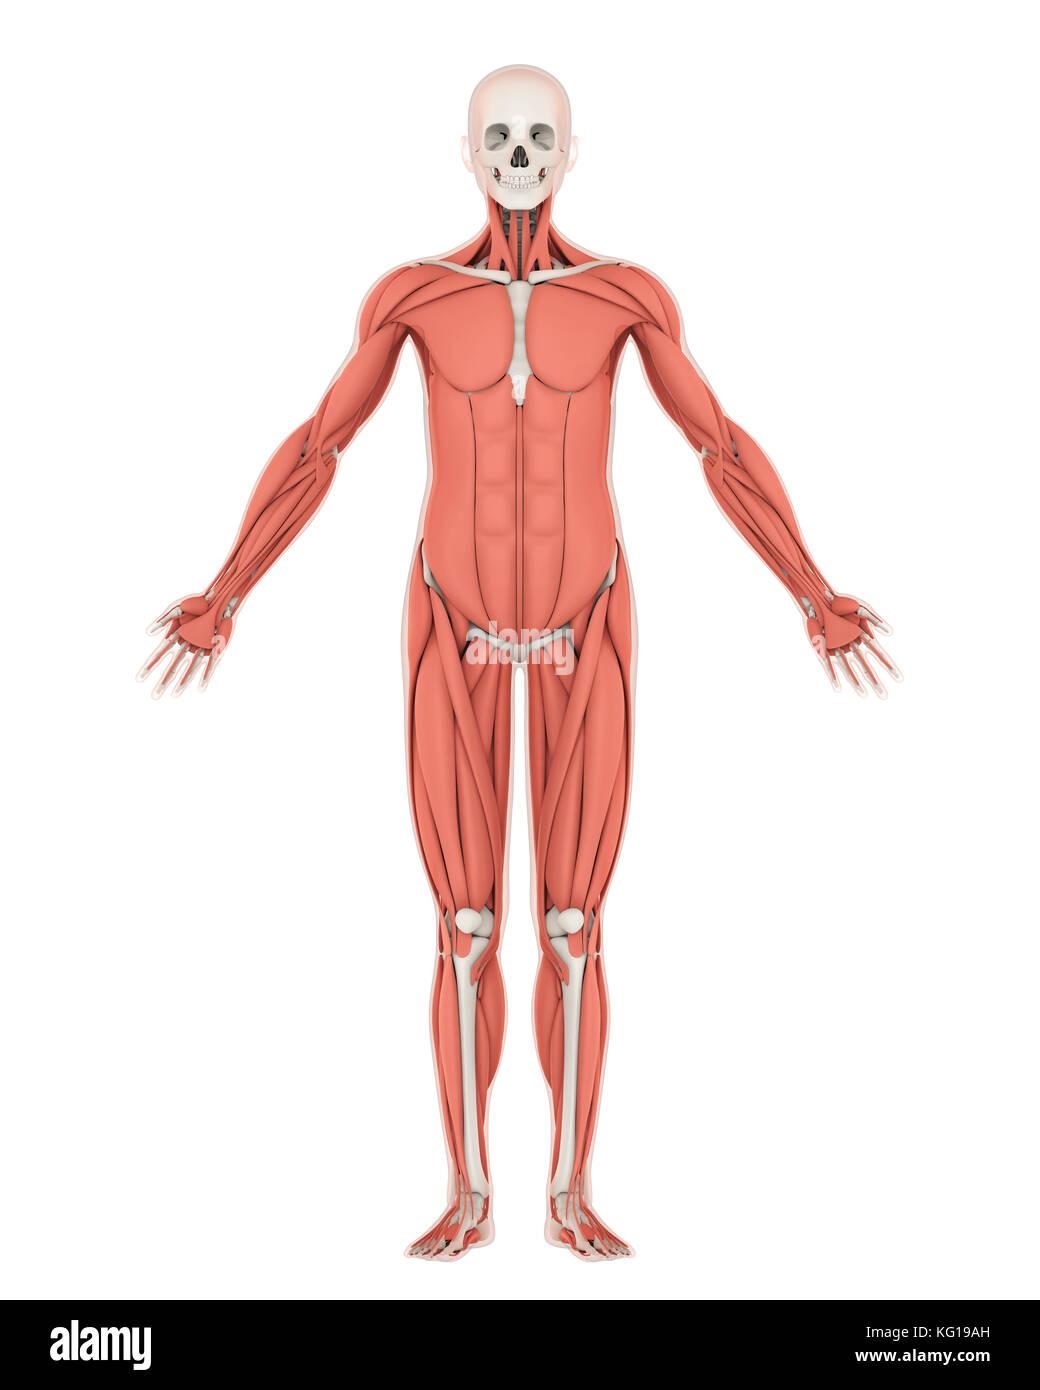 Skeletal Man Stockfotos & Skeletal Man Bilder - Seite 3 - Alamy